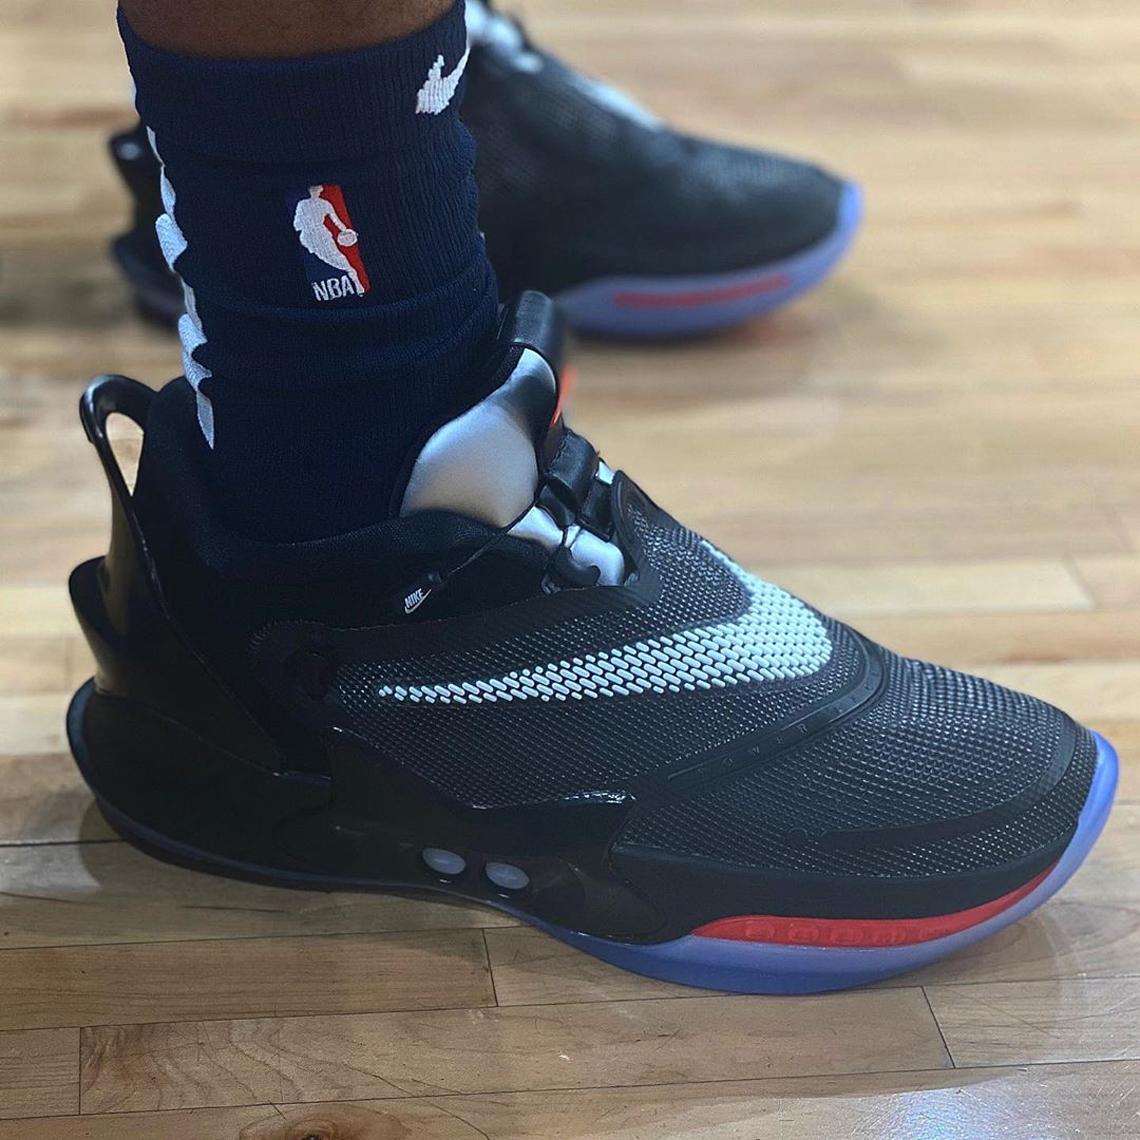 Nike Adapt Bb 2 0 Bq5397 001 Release Info Sneakernews Com